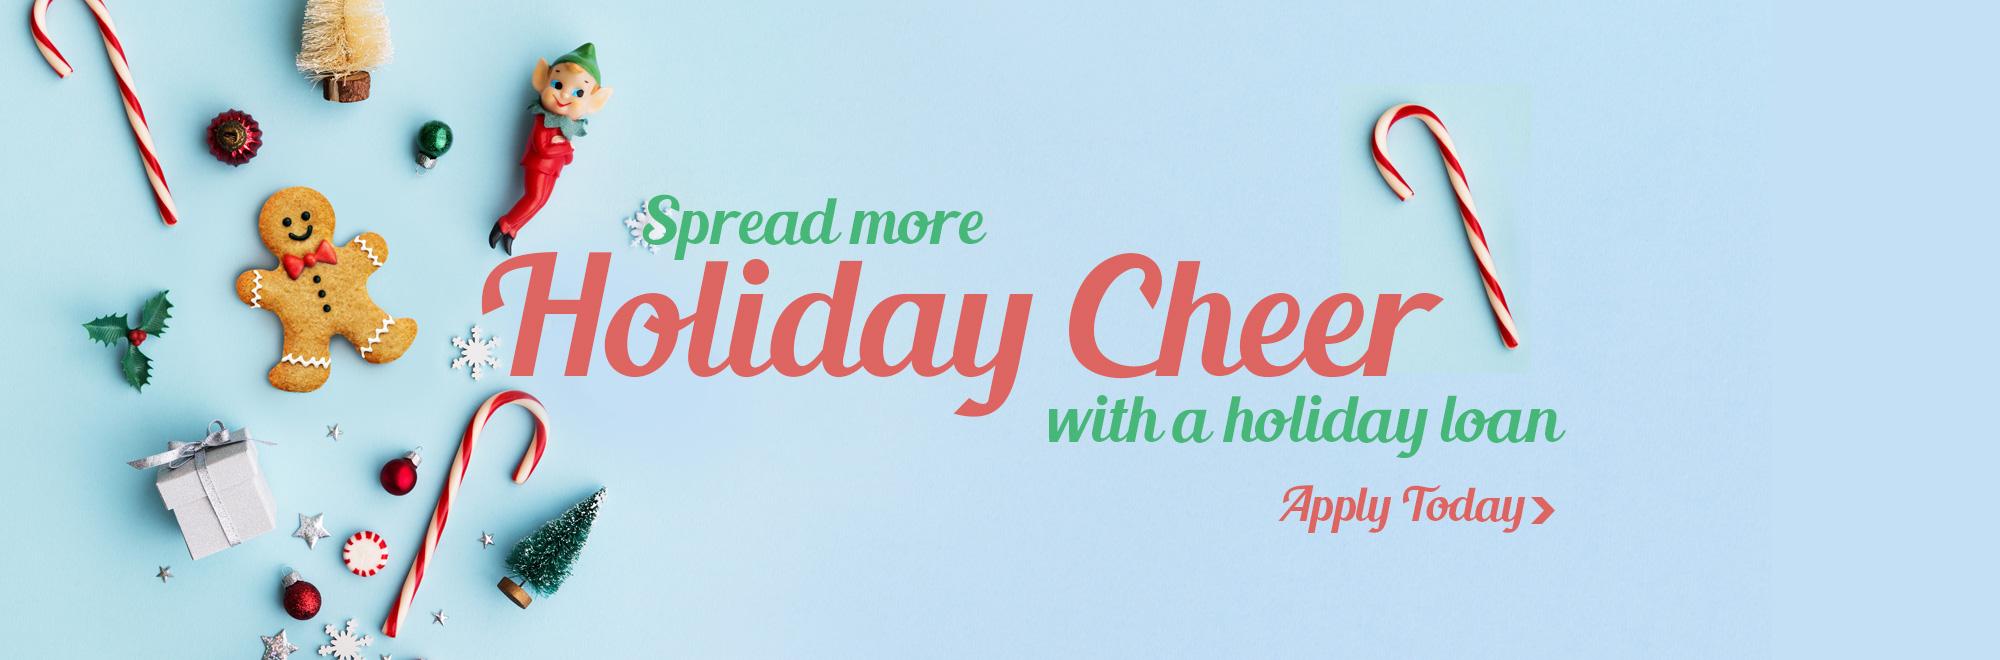 holiday cheer banner